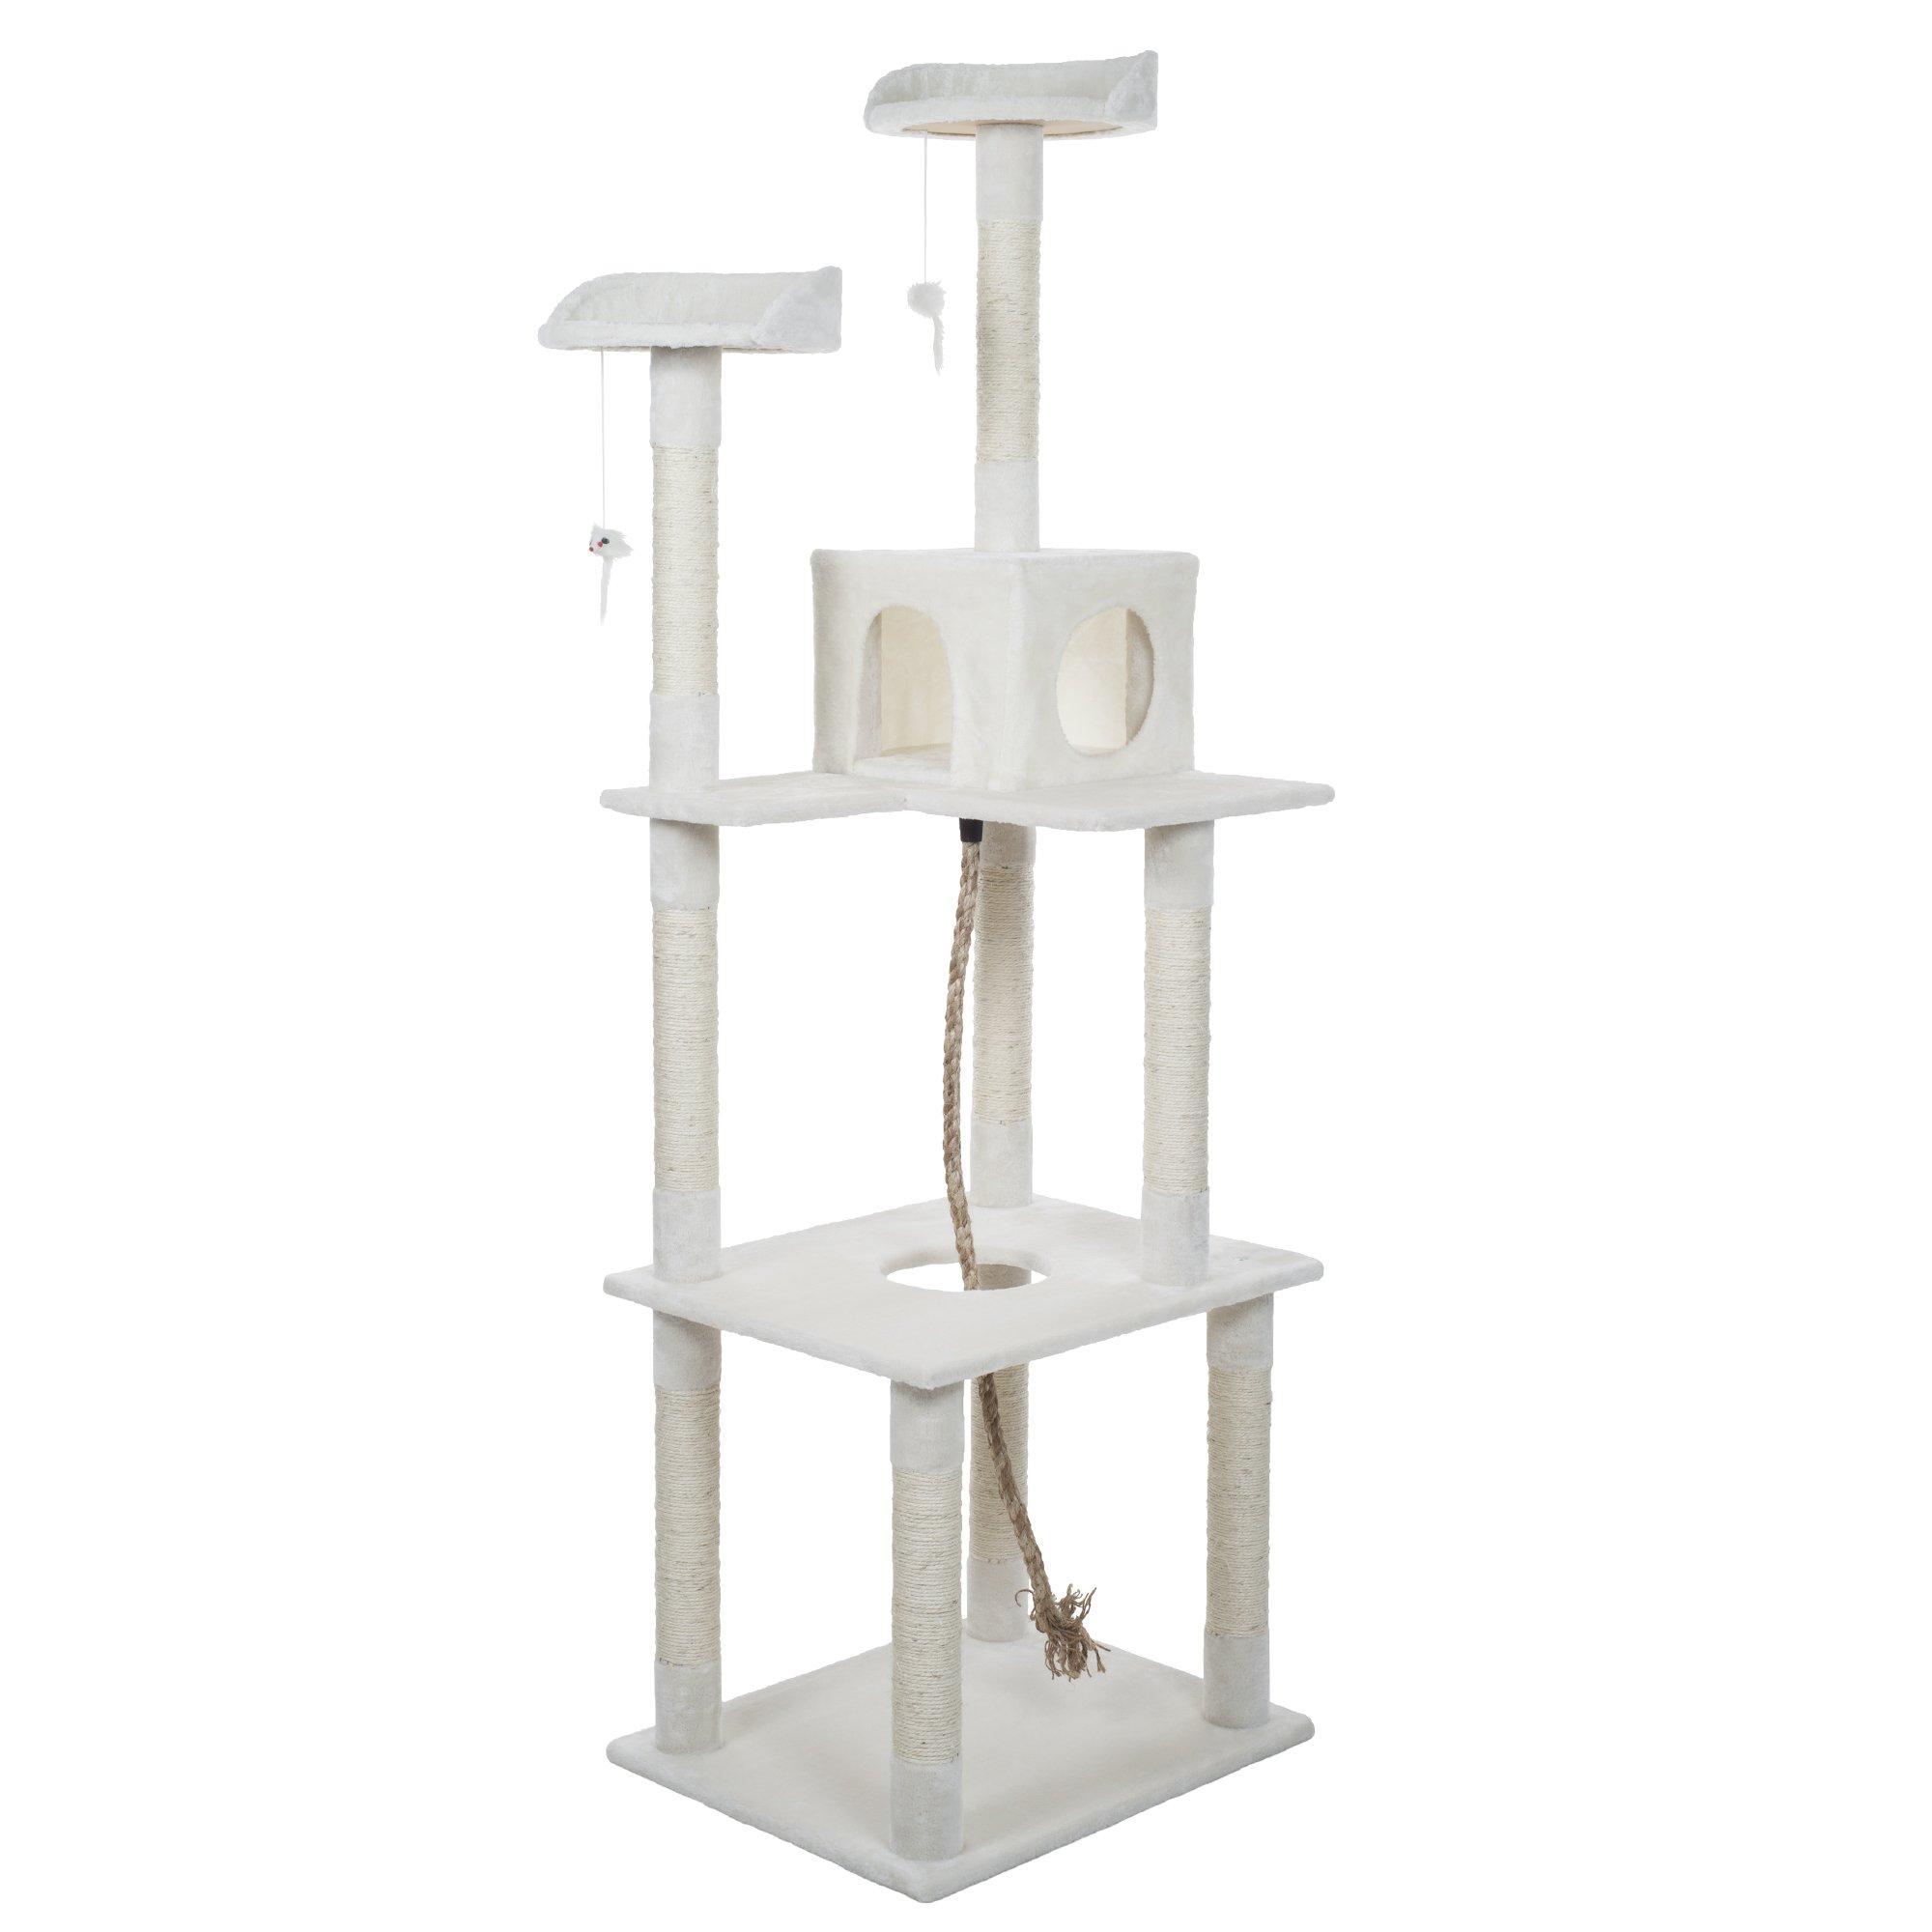 PETMAKER Sleep and Play Cat Toy Tree, 6', Ivory